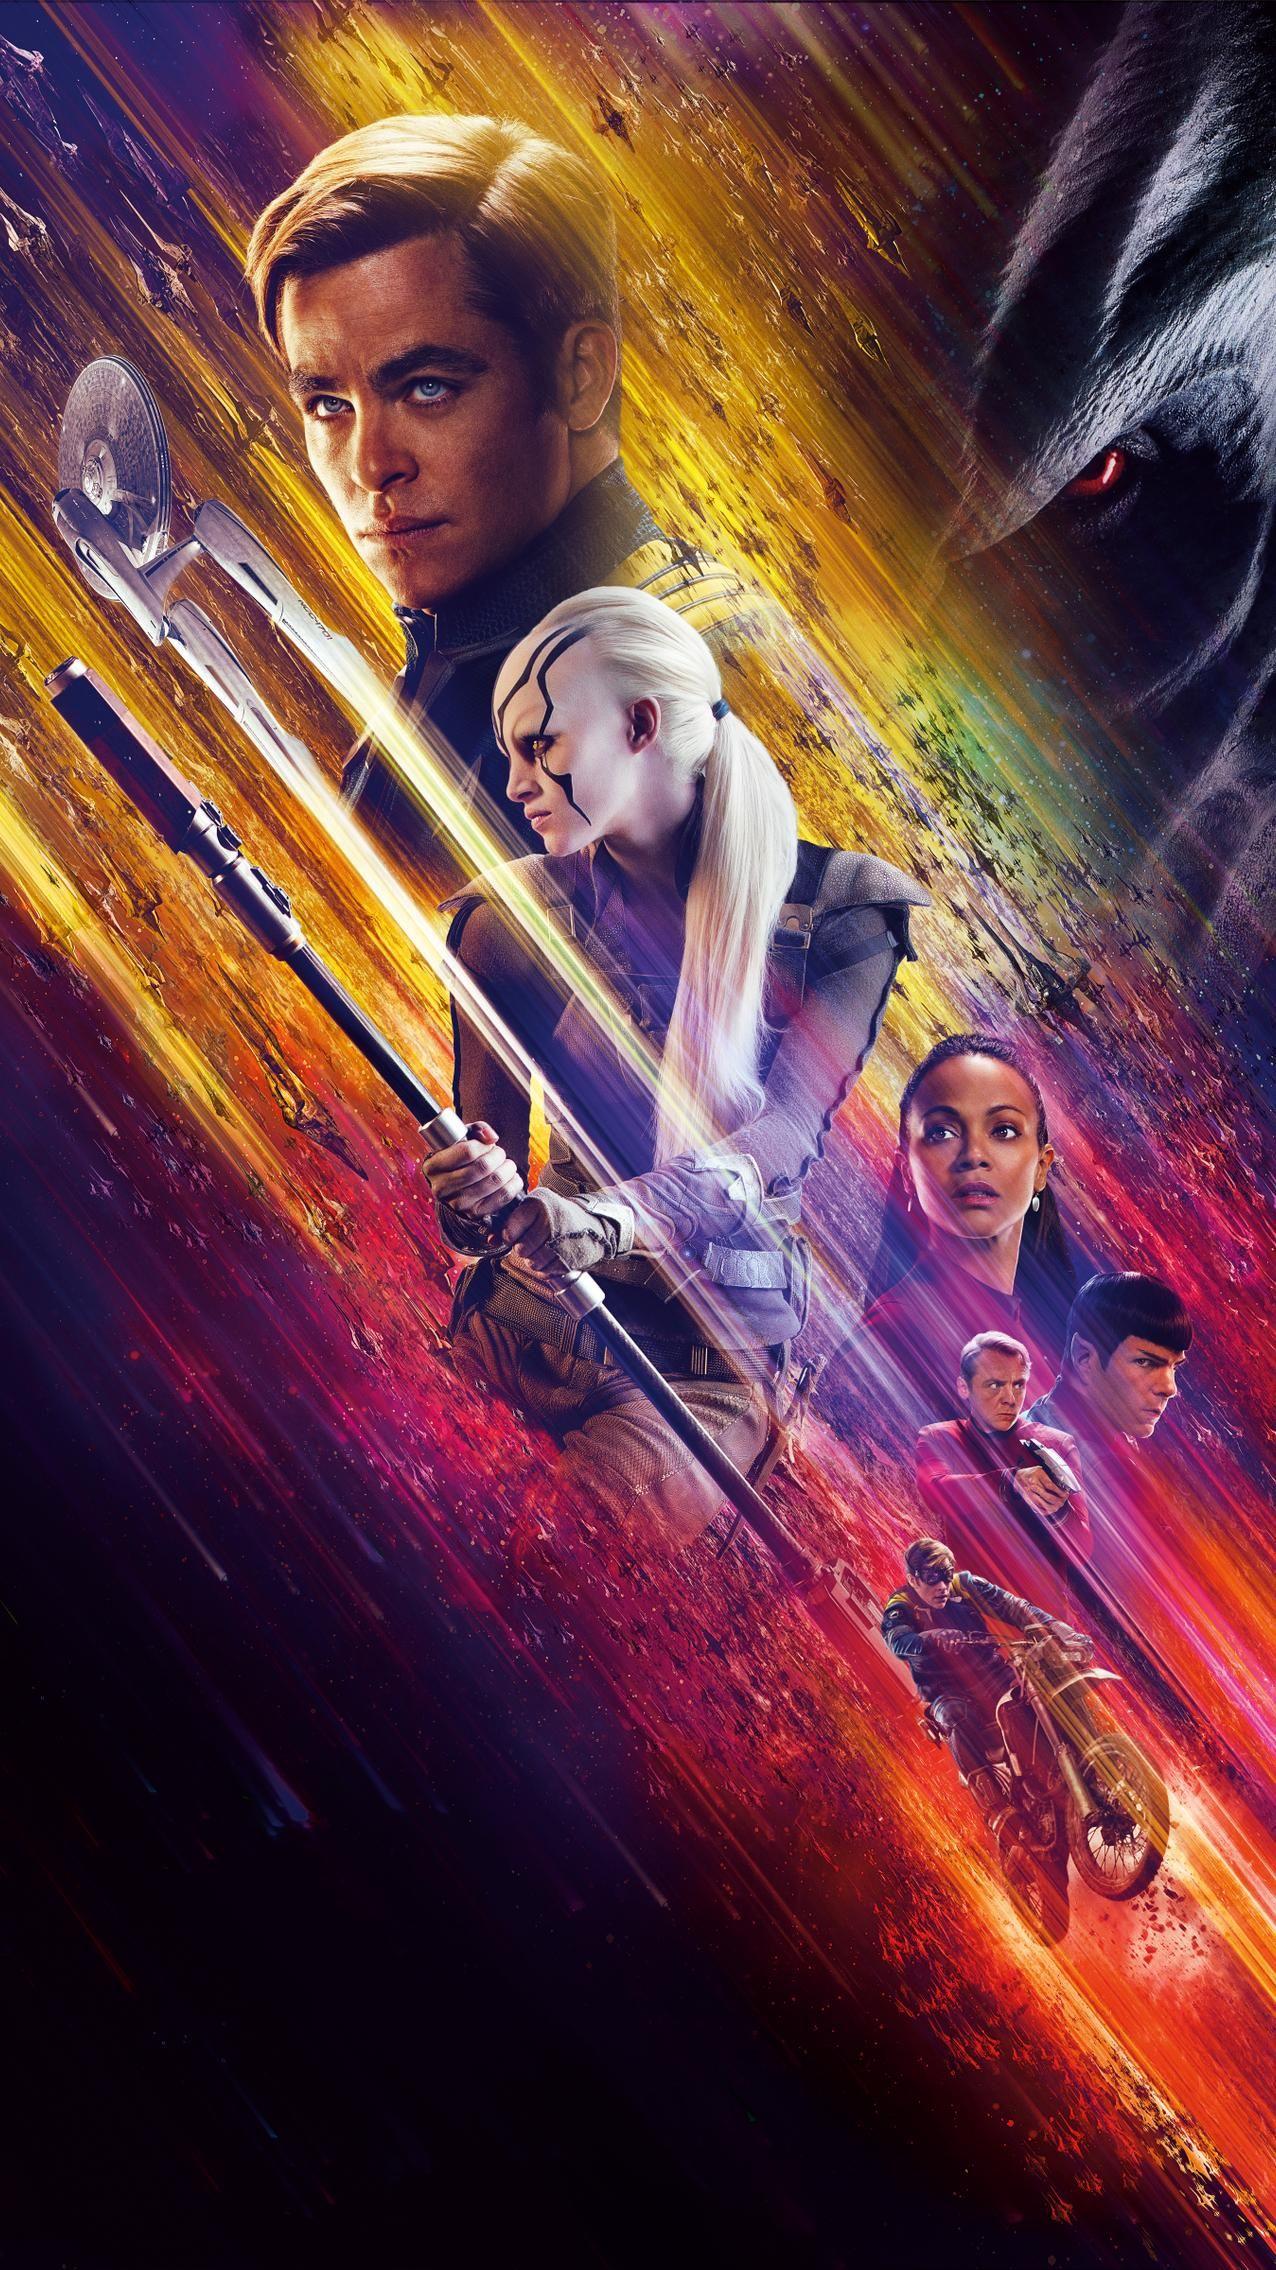 Star Trek Beyond 2016 Phone Wallpaper Moviemania Star Trek Wallpaper Star Trek Beyond Movie Star Trek Beyond